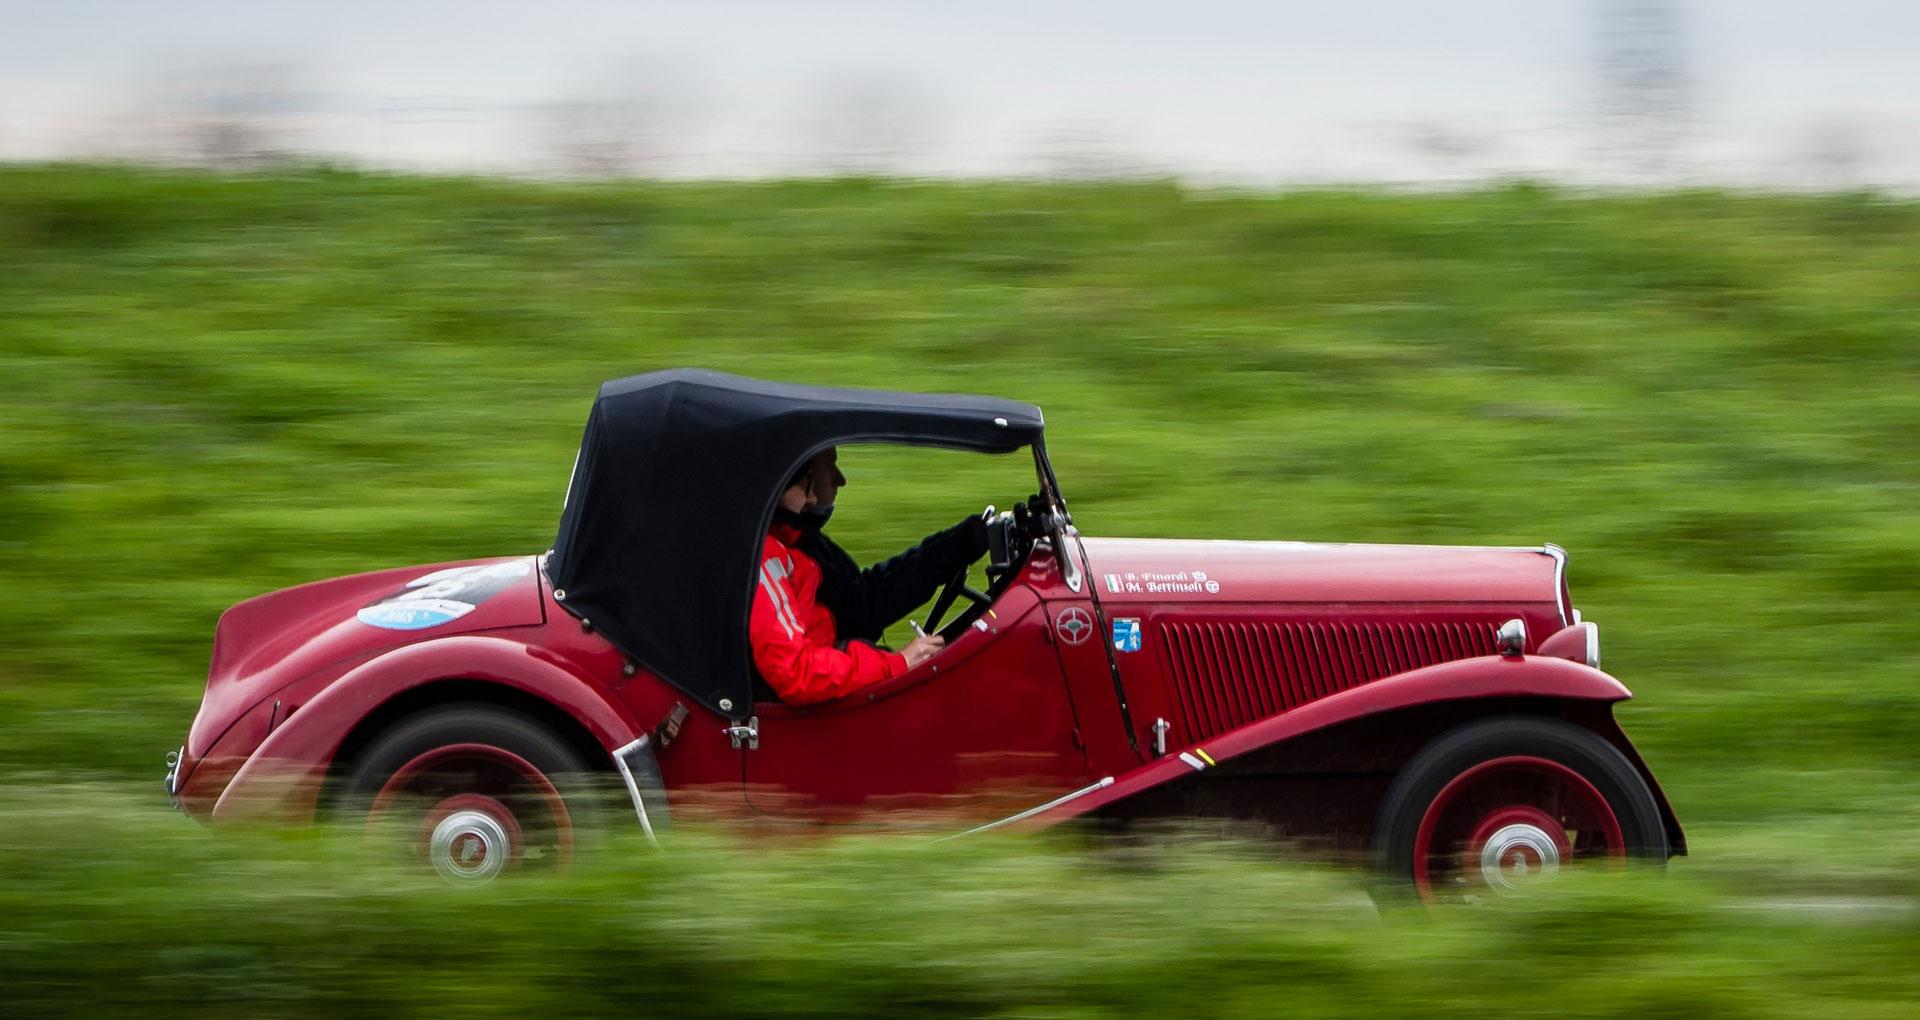 http://trofeoforesti.it/wp-content/uploads/2018/12/foto-banner-auto-rossa.jpg